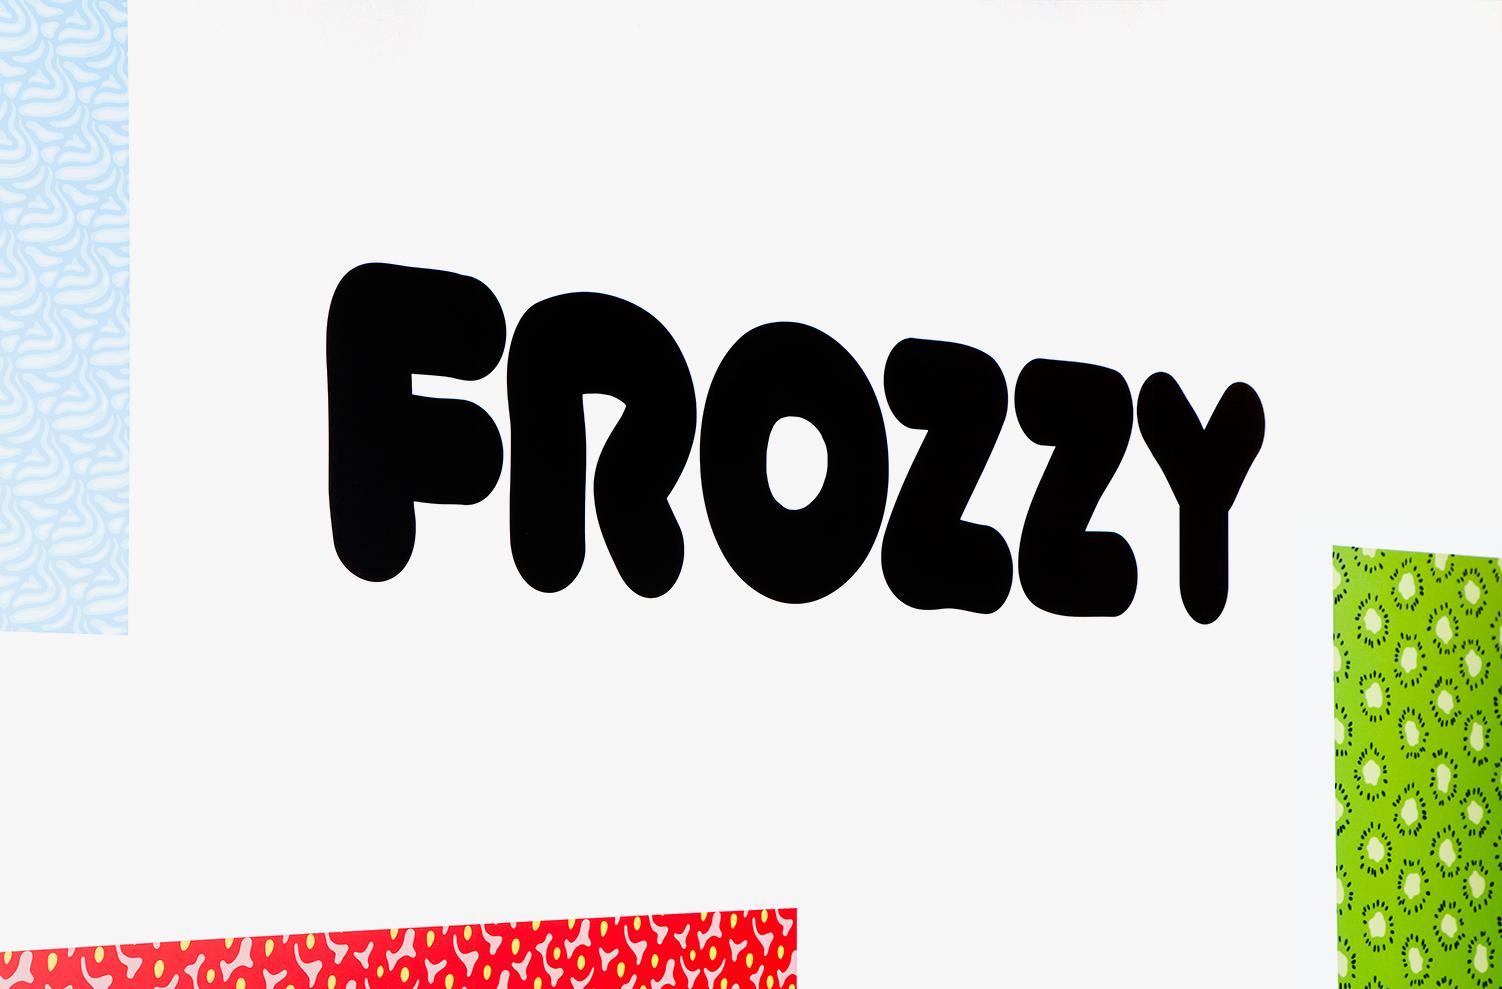 ritator_frozzy_identity_3